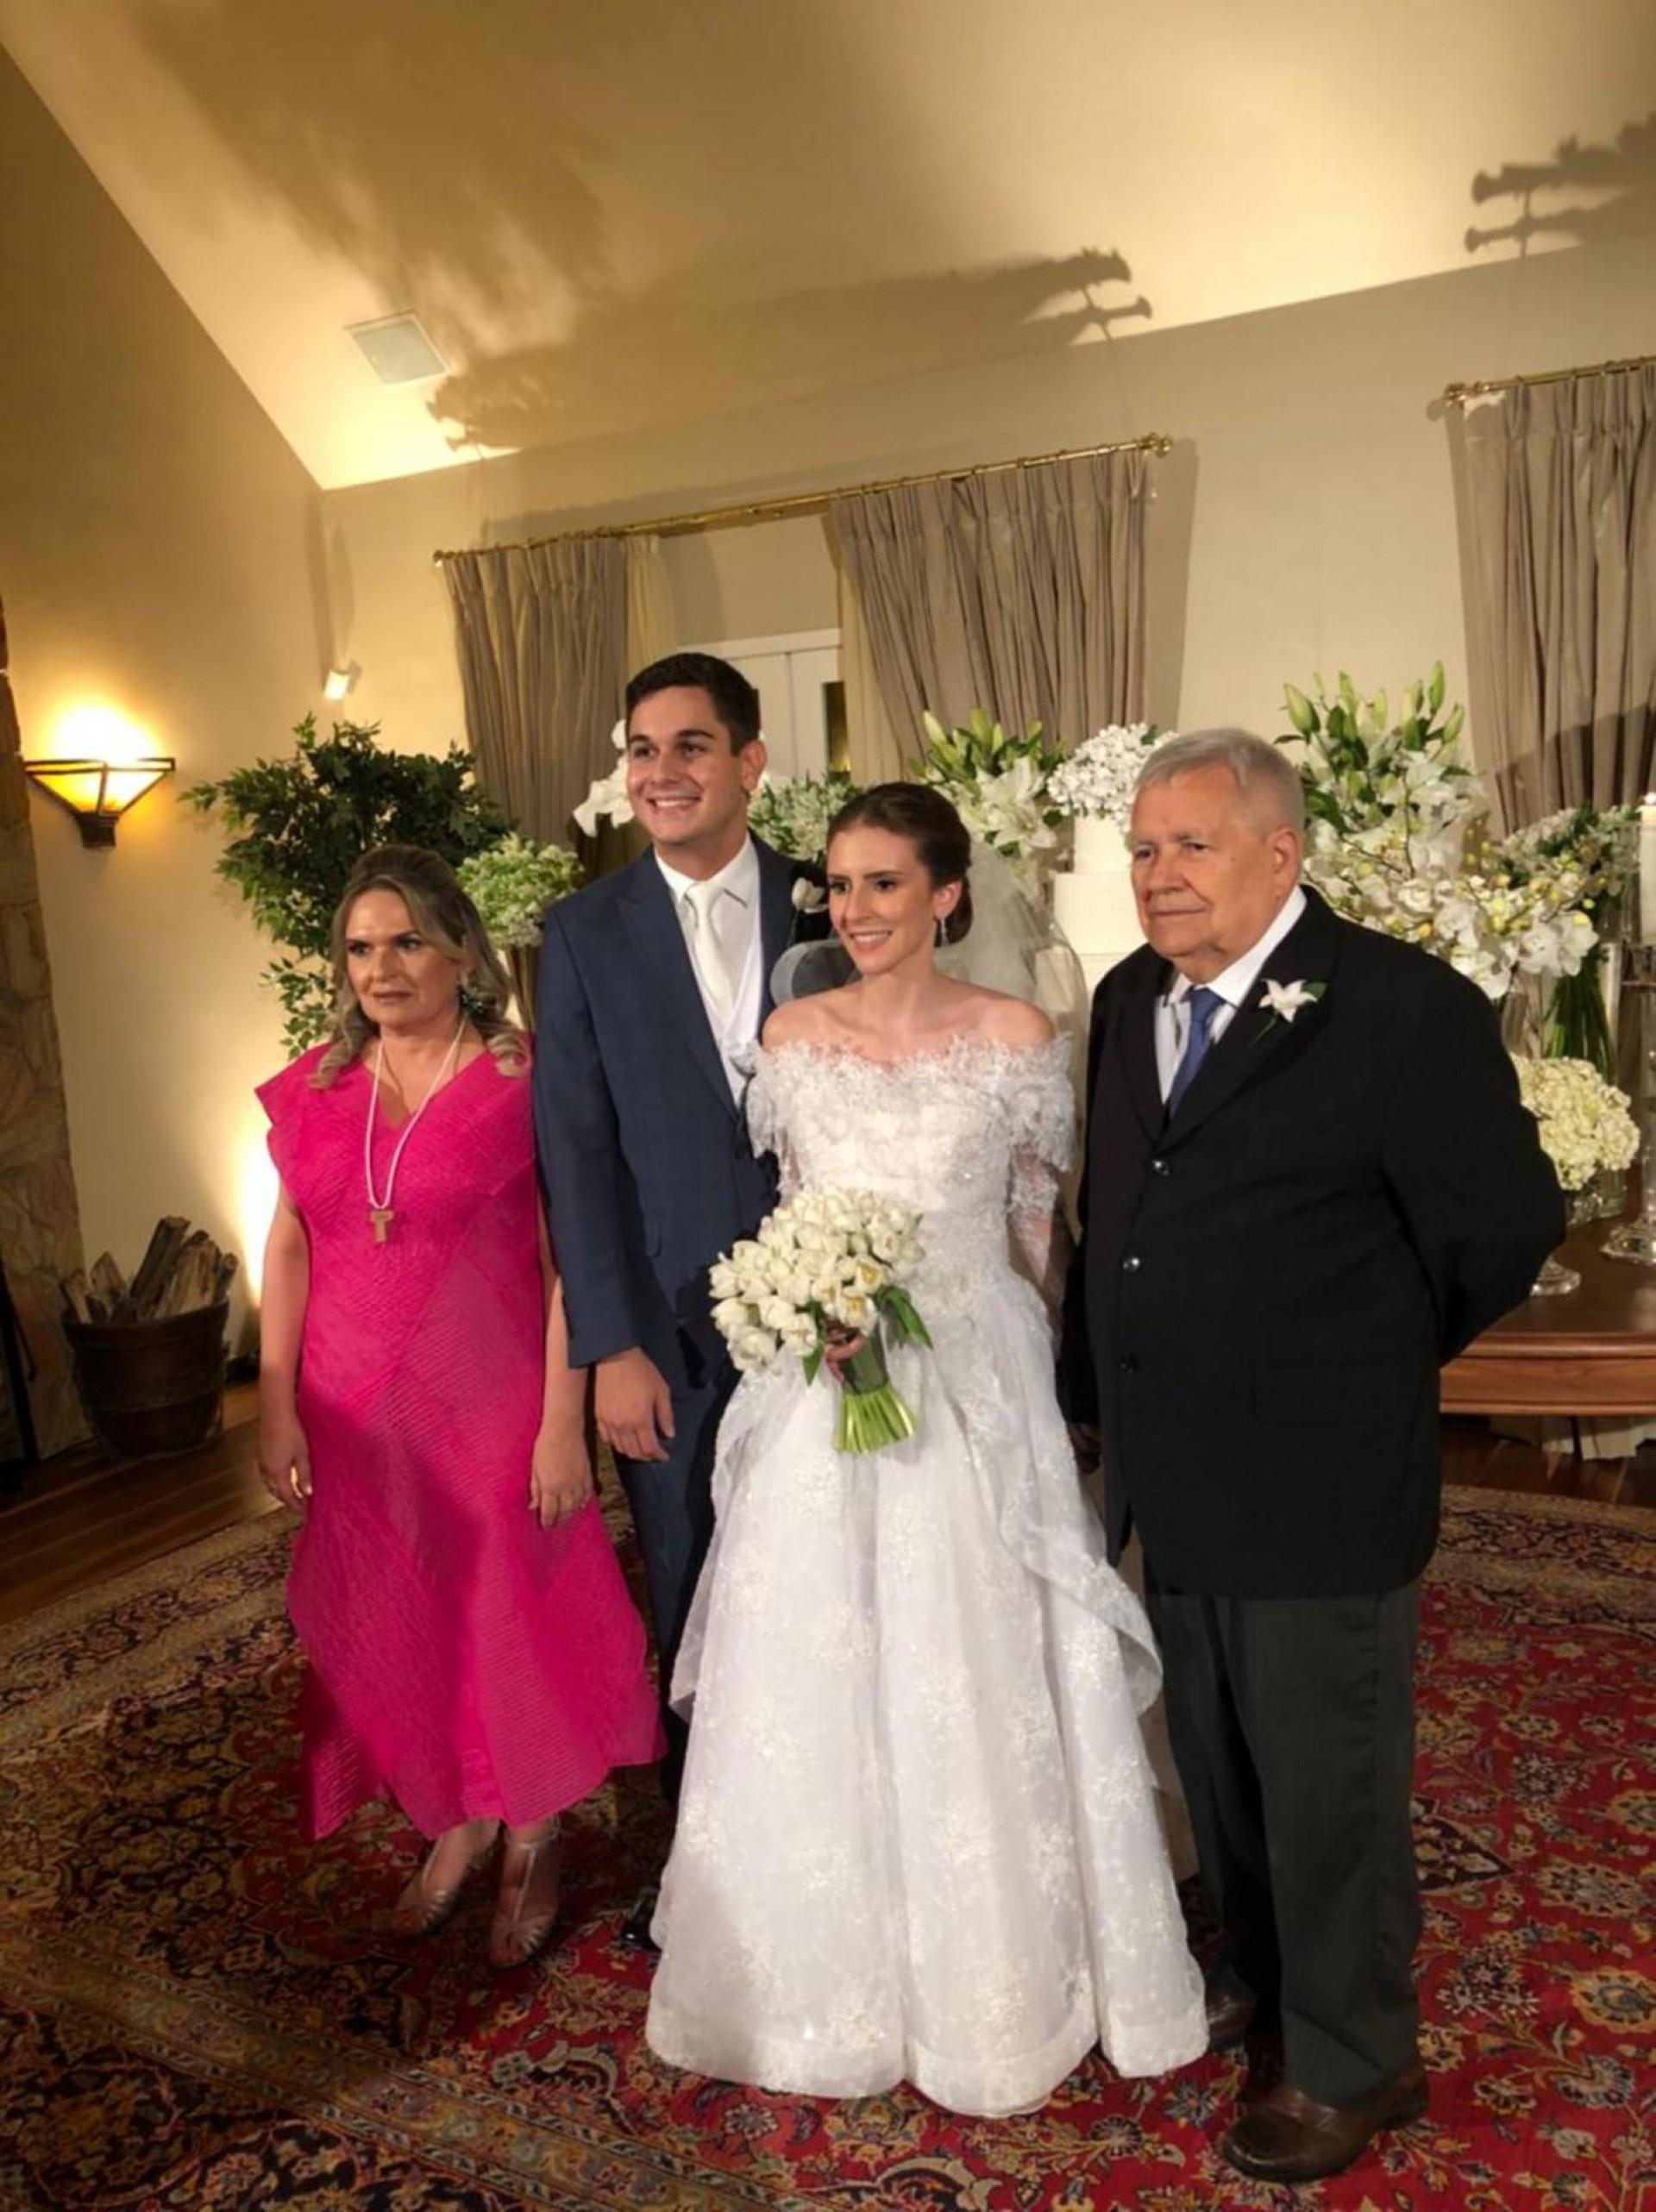 Os noivos com Márcia Lima (tia) e o avô do noivo Roberto Araújo